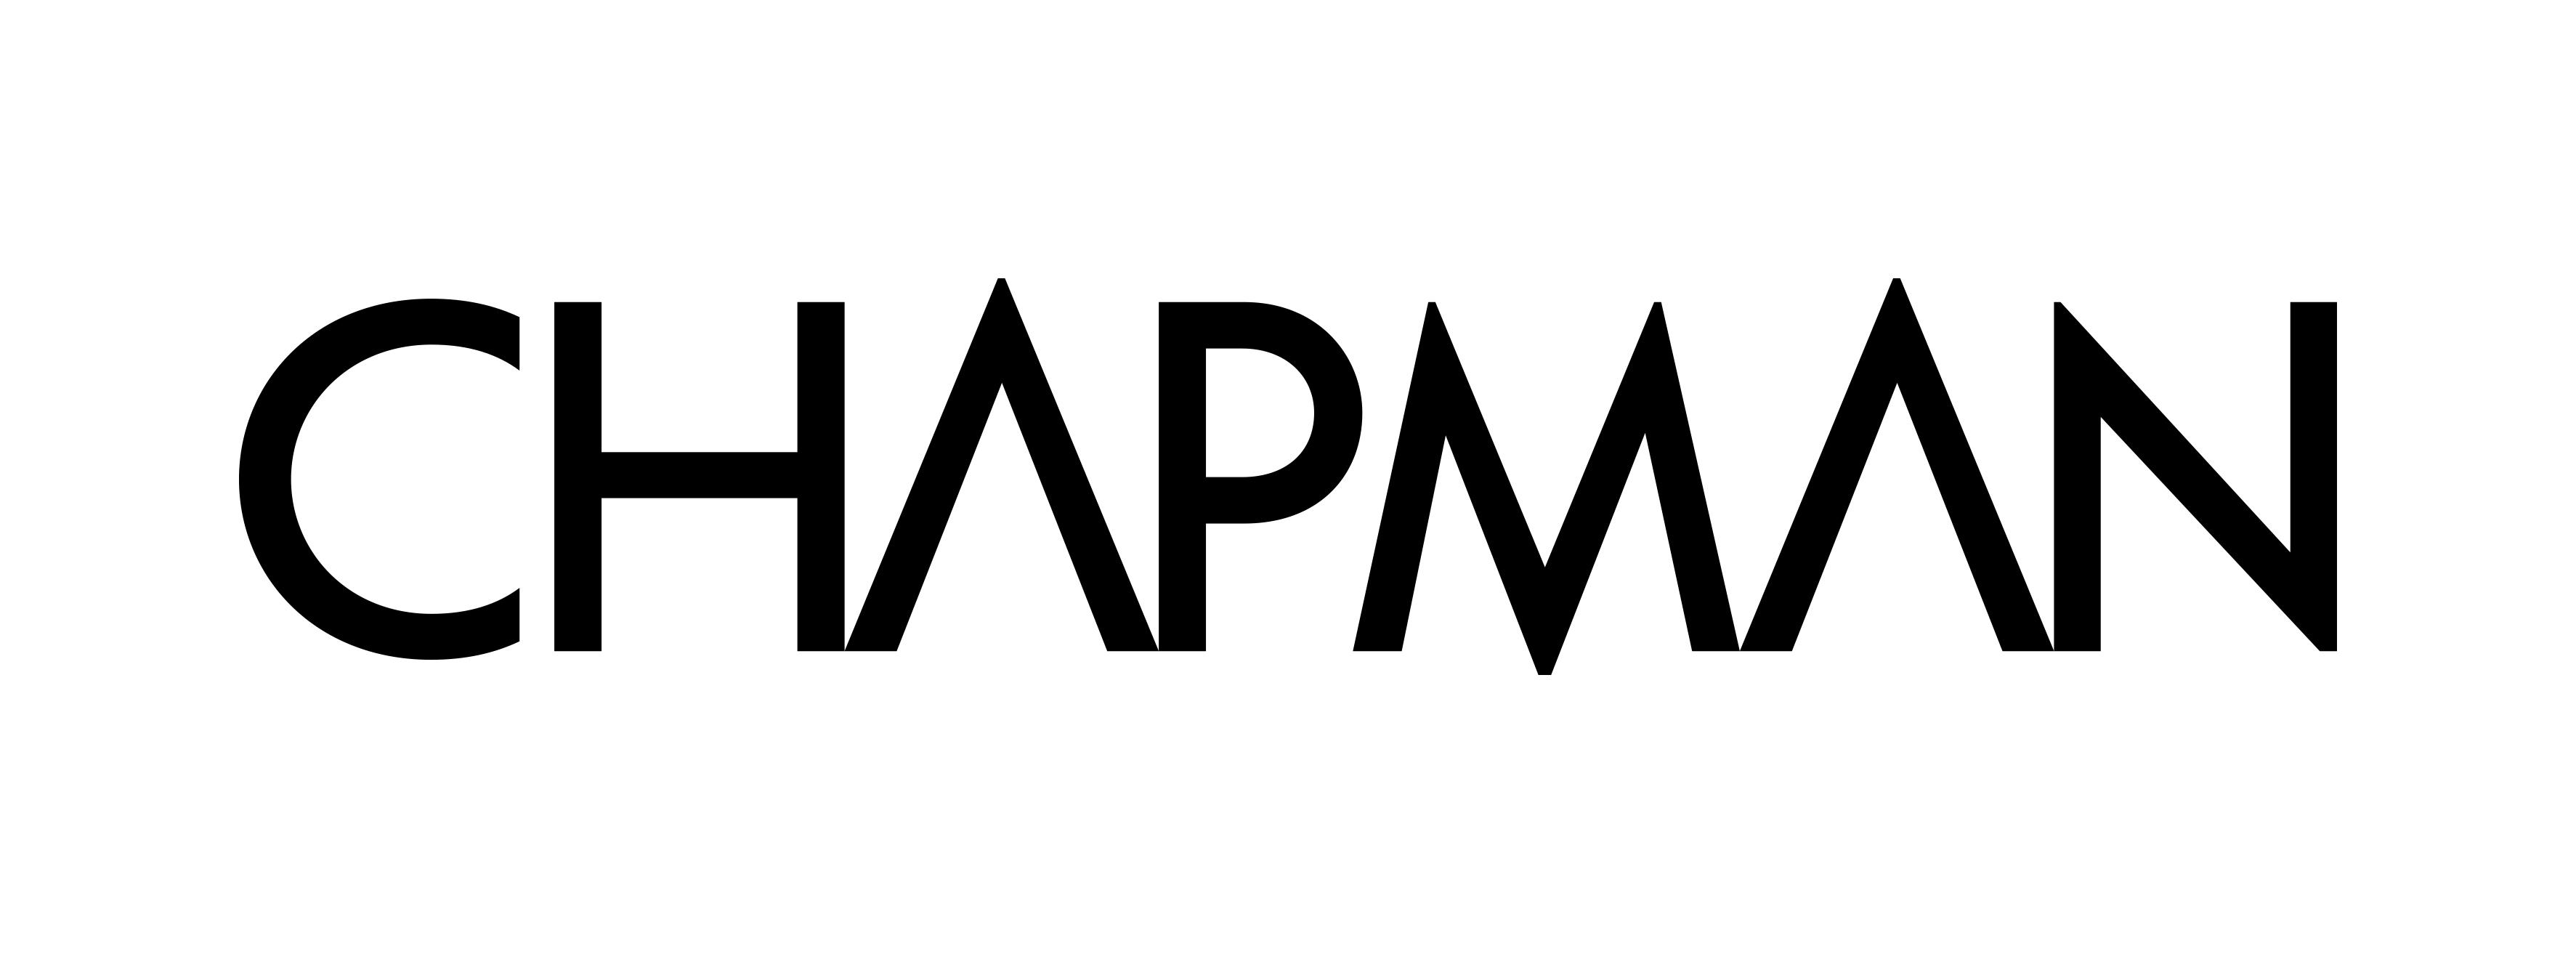 chapman logo design  u2013 edi udo